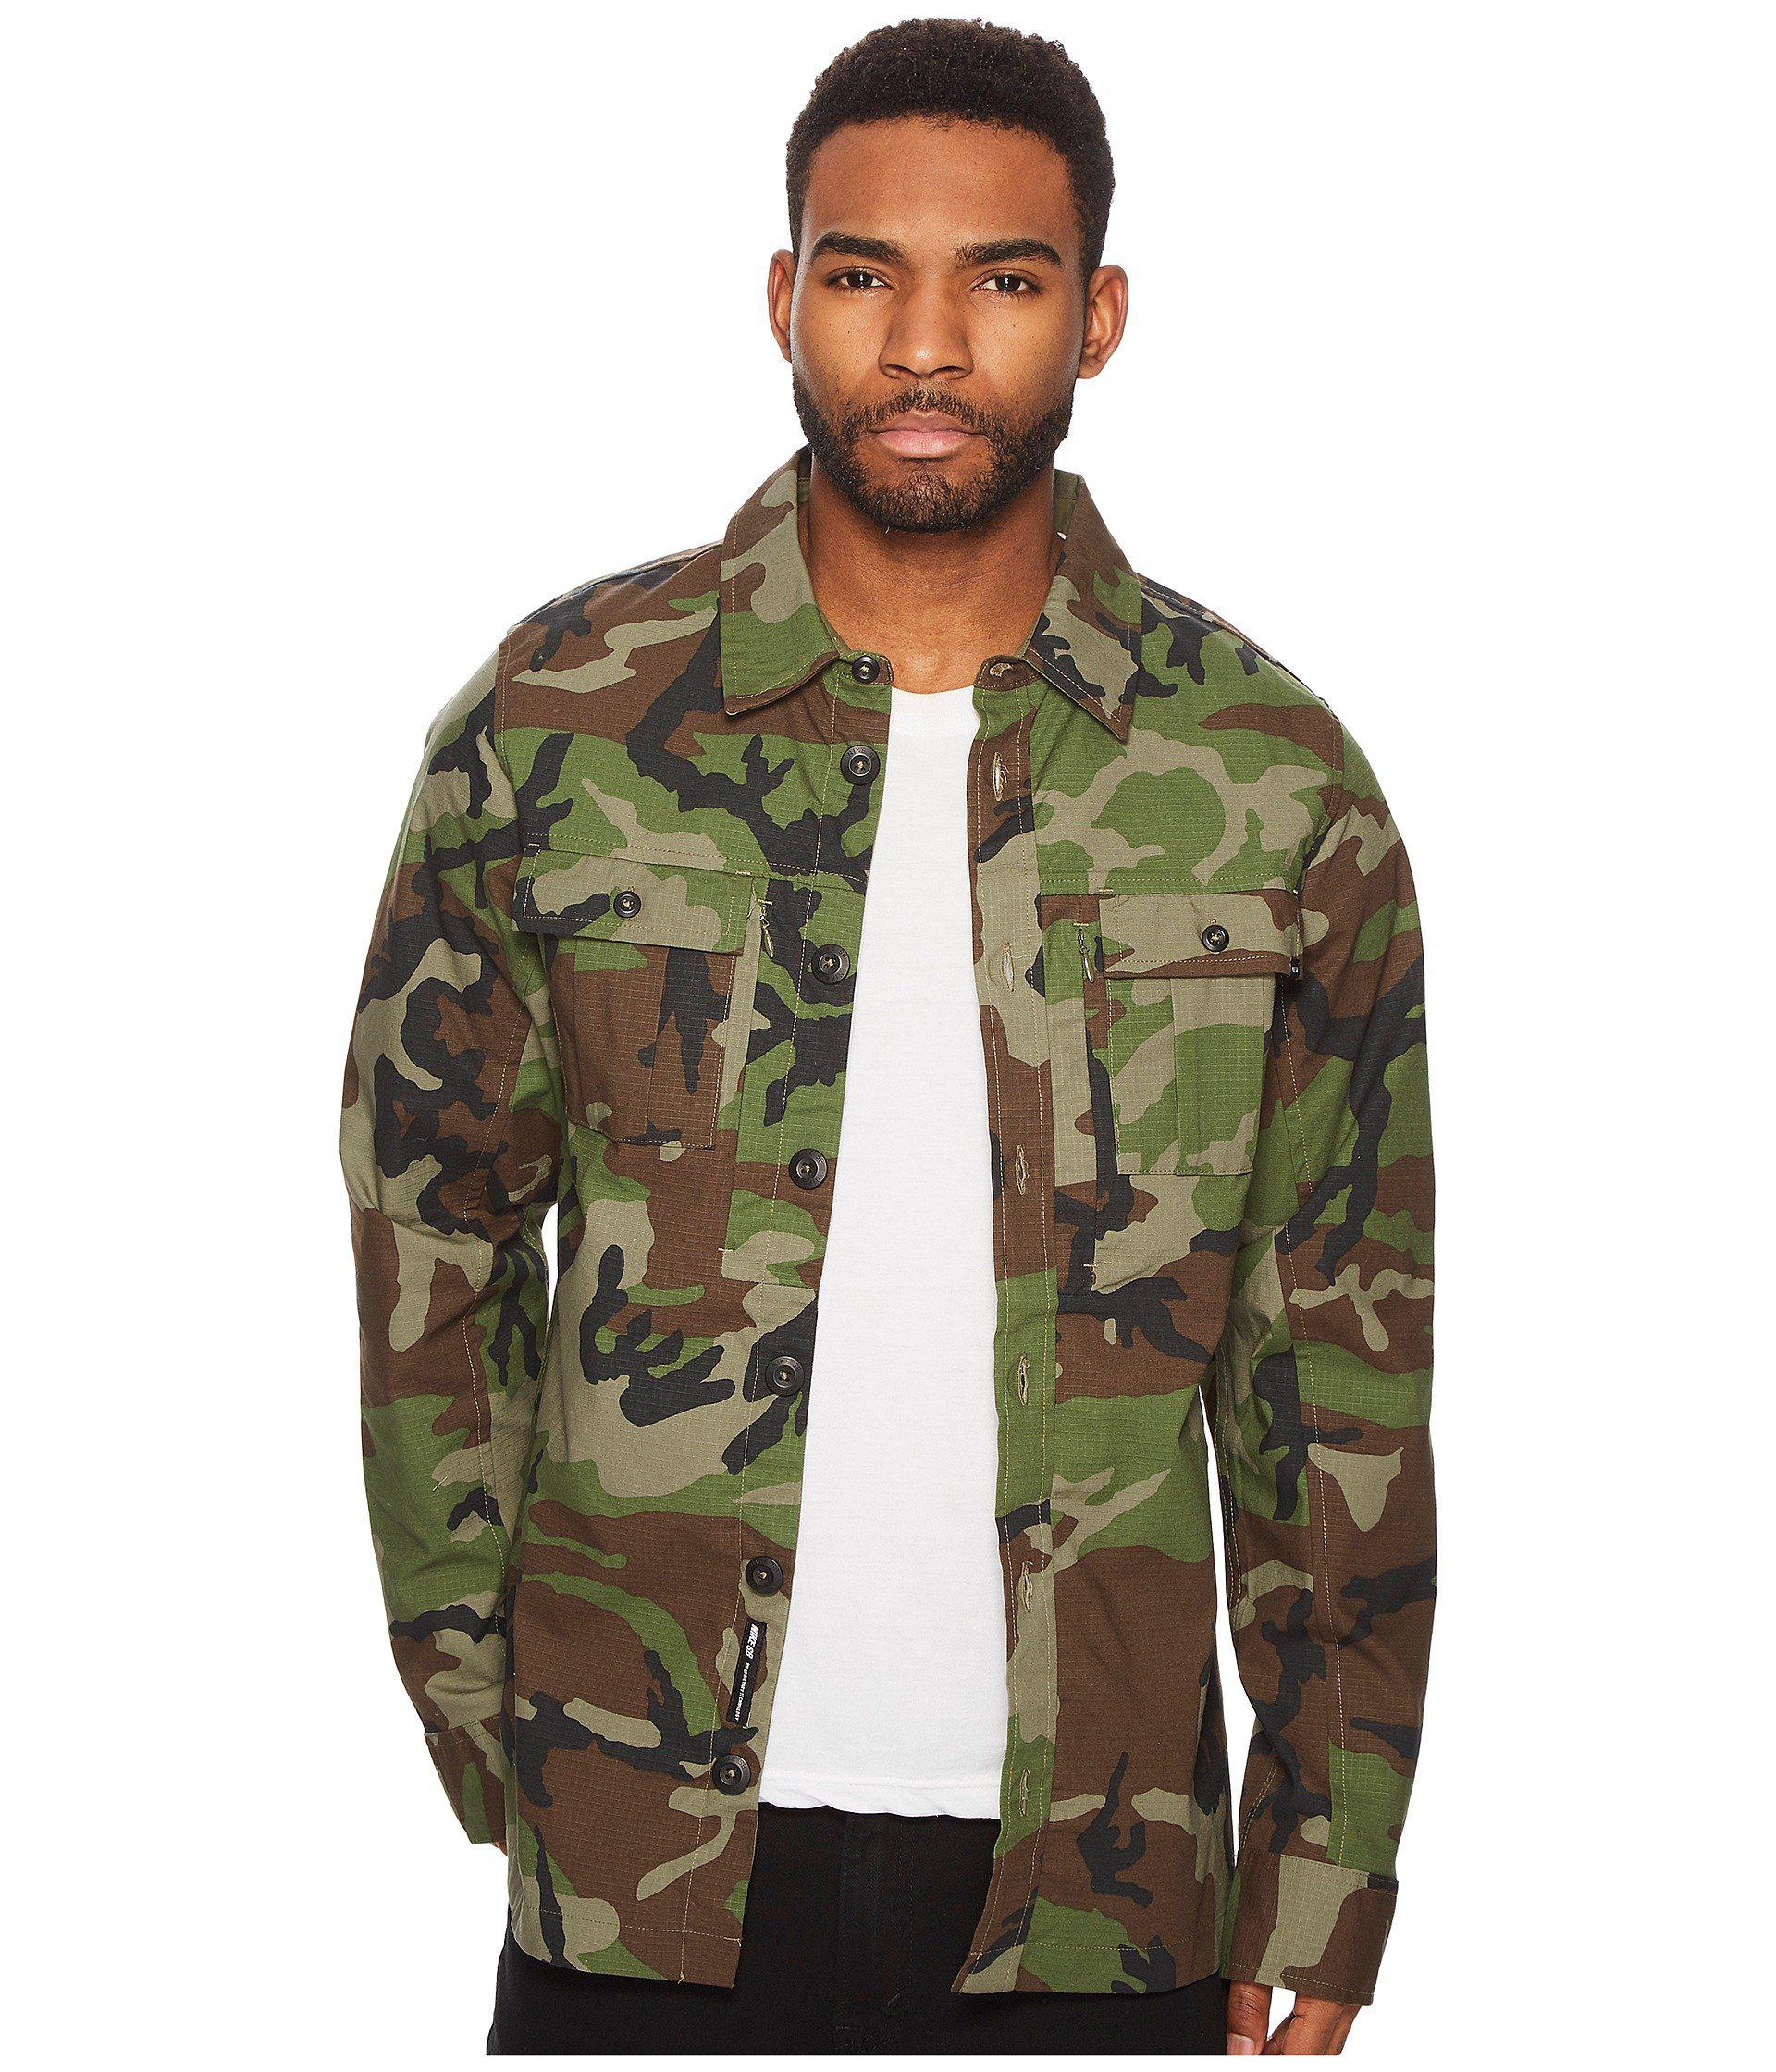 bd71e0b75b013 Lyst - Nike Sb Flex Holgate Long Sleeve Camo Top in Green for Men